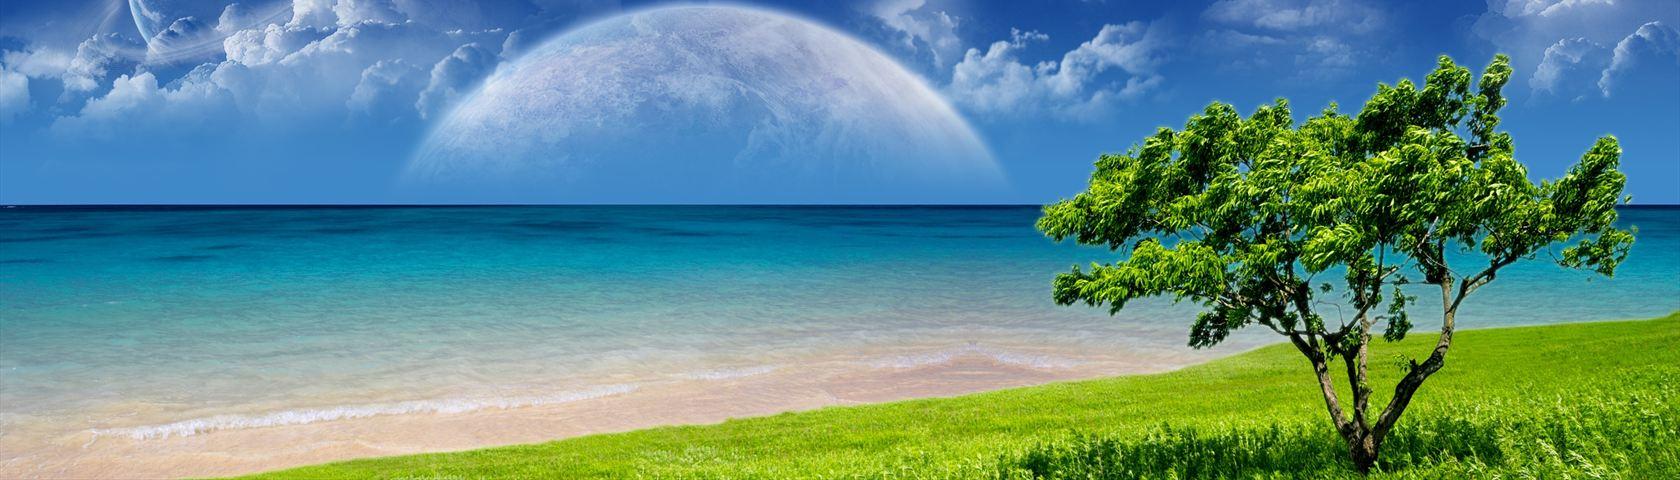 Beach Planets